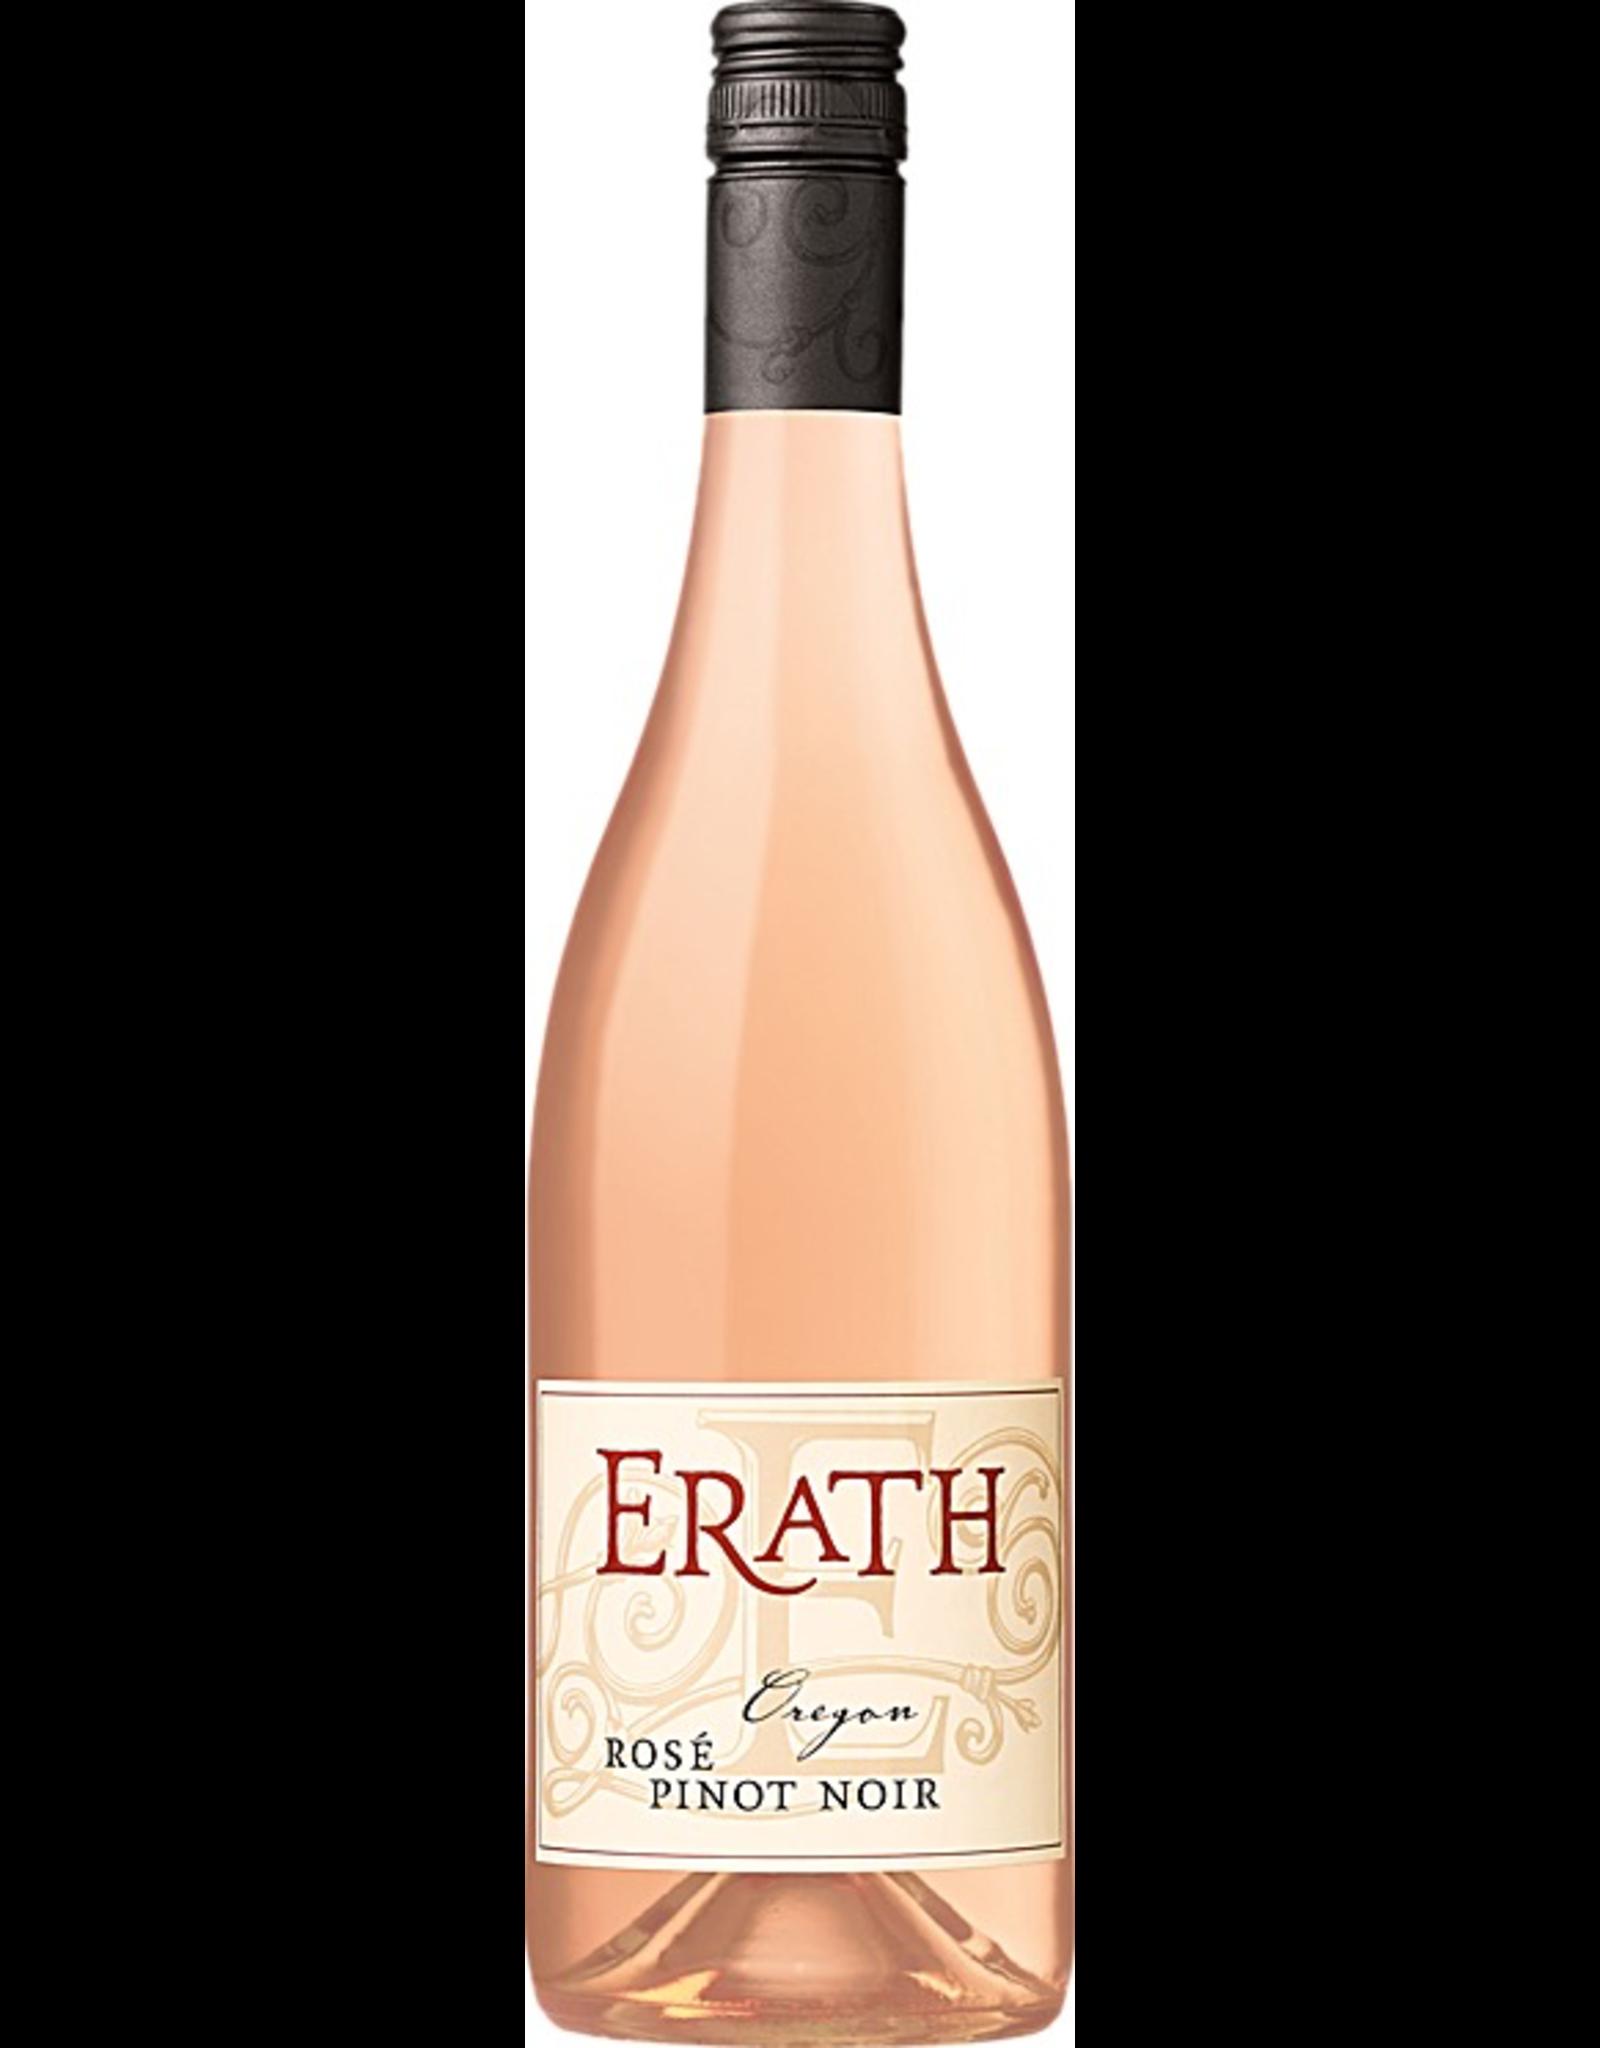 Rose Wine 2018, Erath Rose, Pinot Noir, Multi-regional Blend, Willamette Valley, Oregon, 13.0% Alc, CT89.7